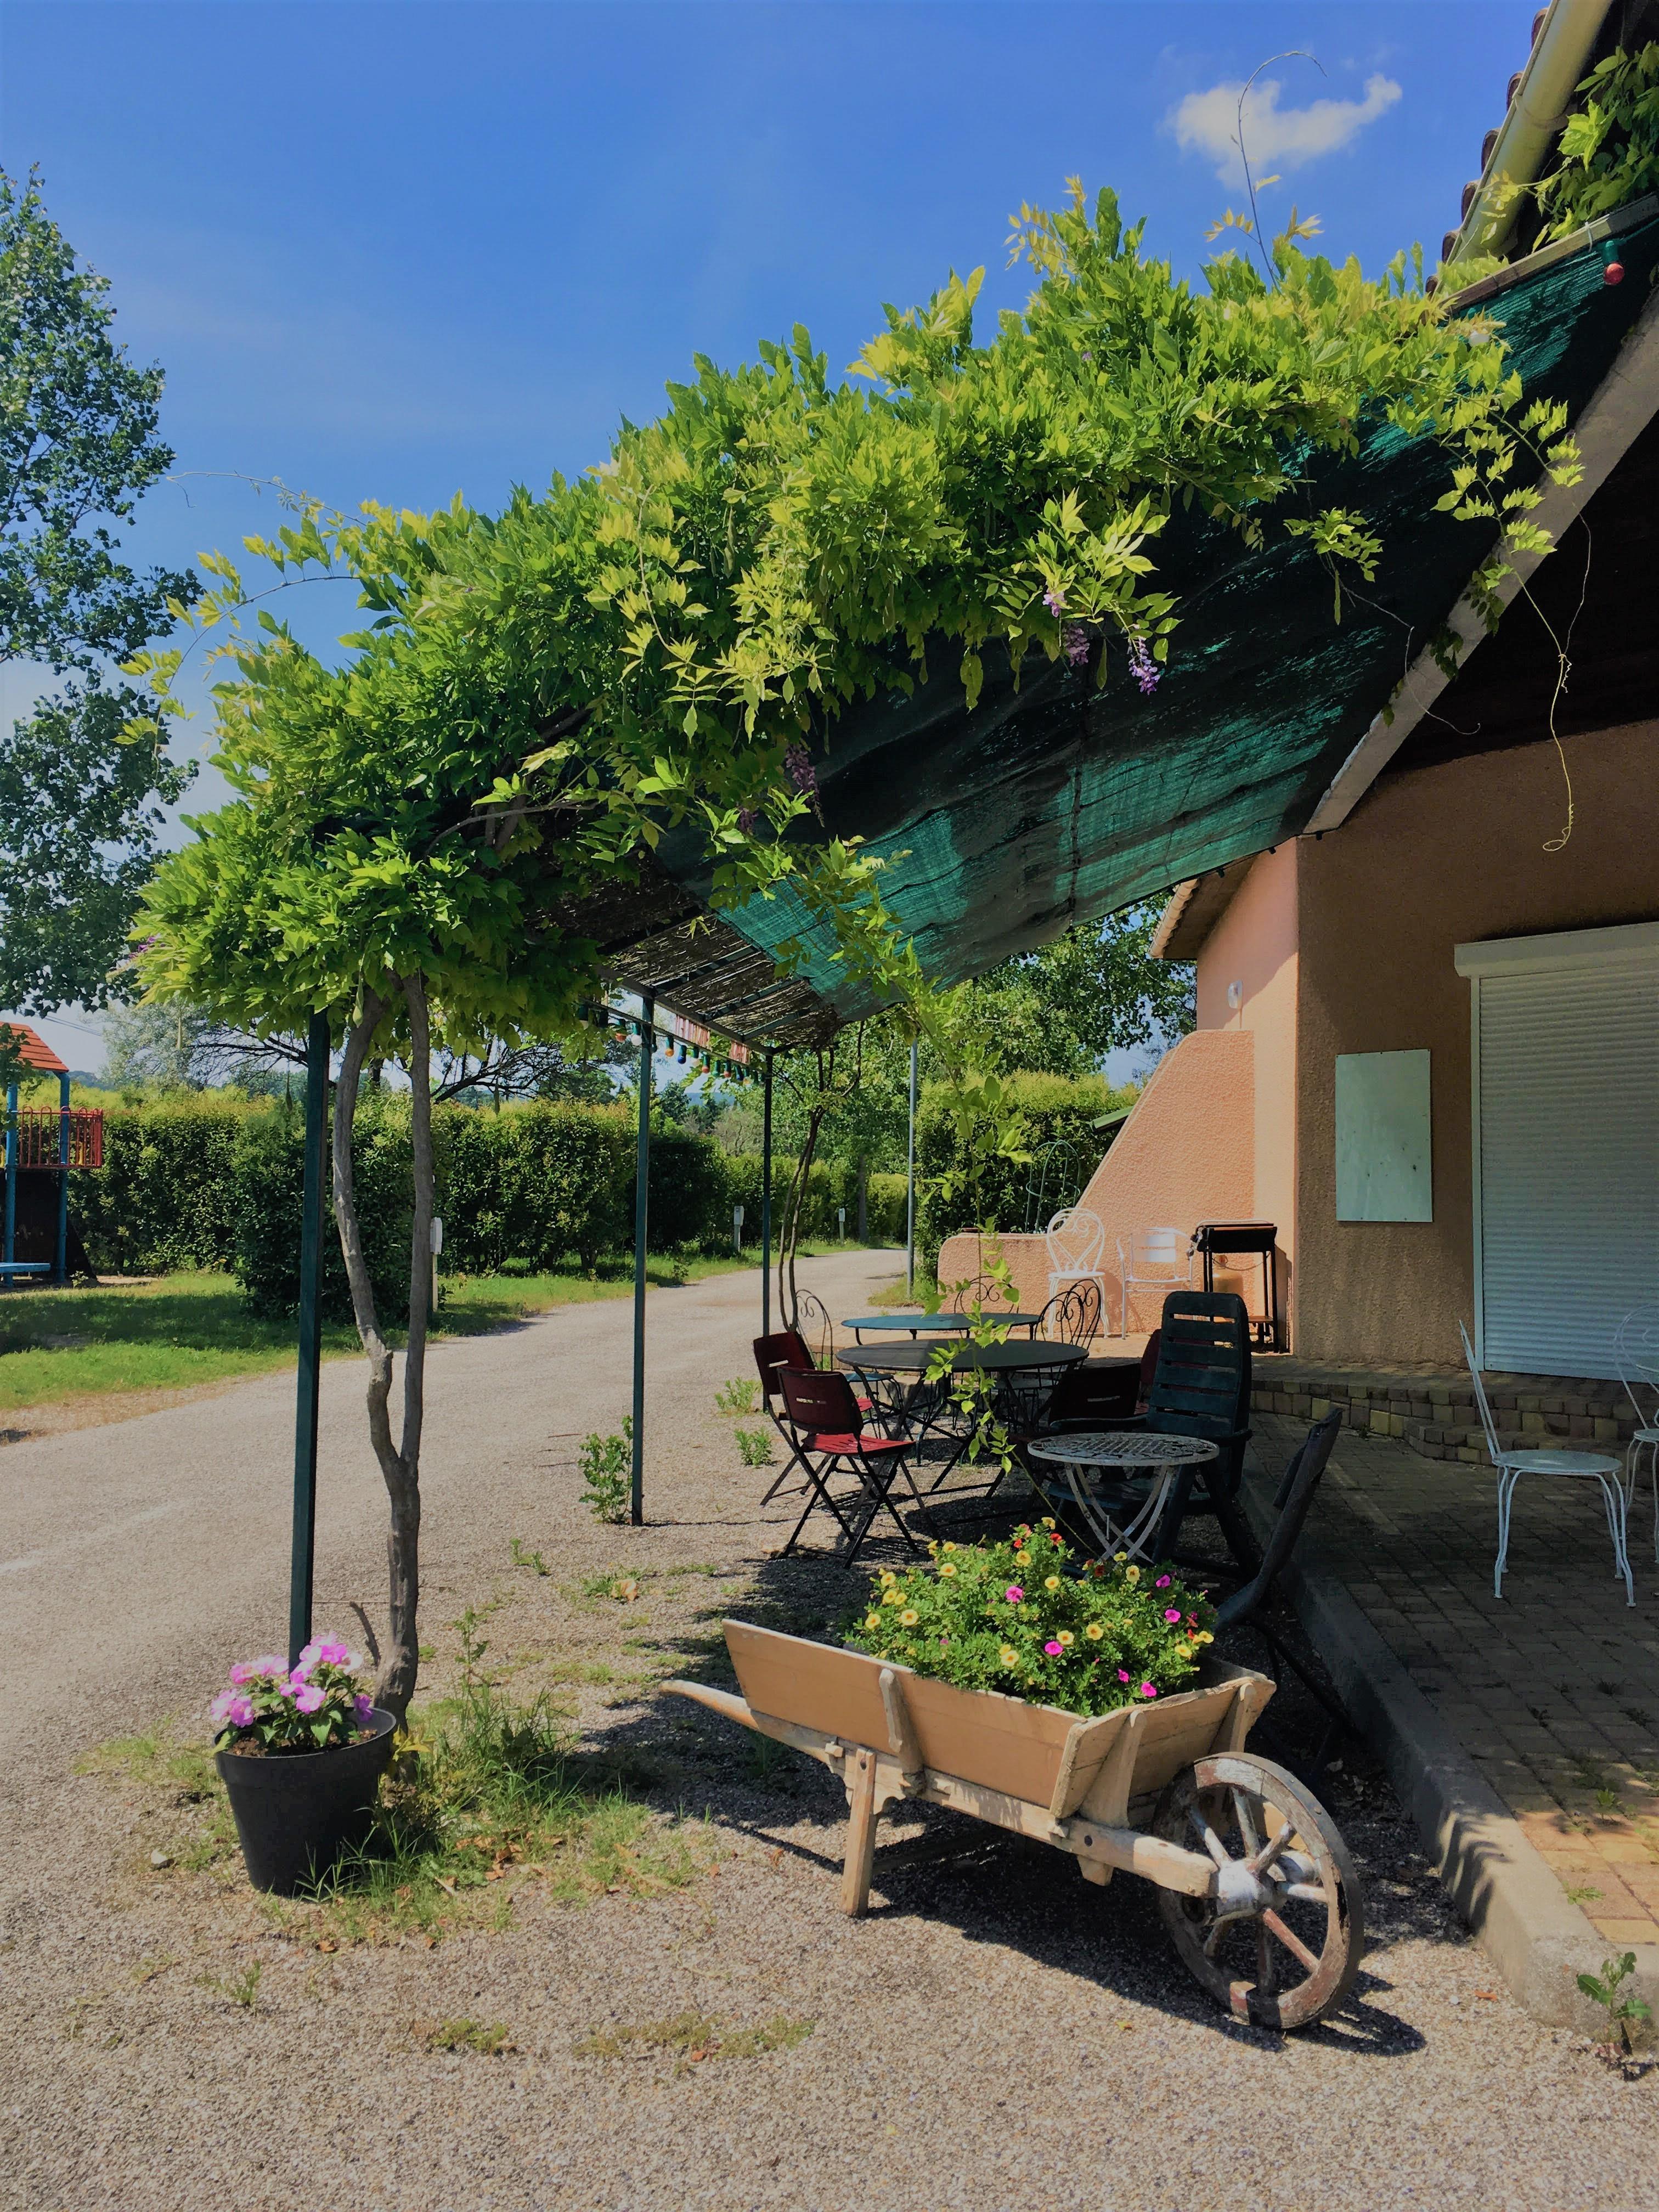 Camping Fradier Nicole, Montolieu, Aude